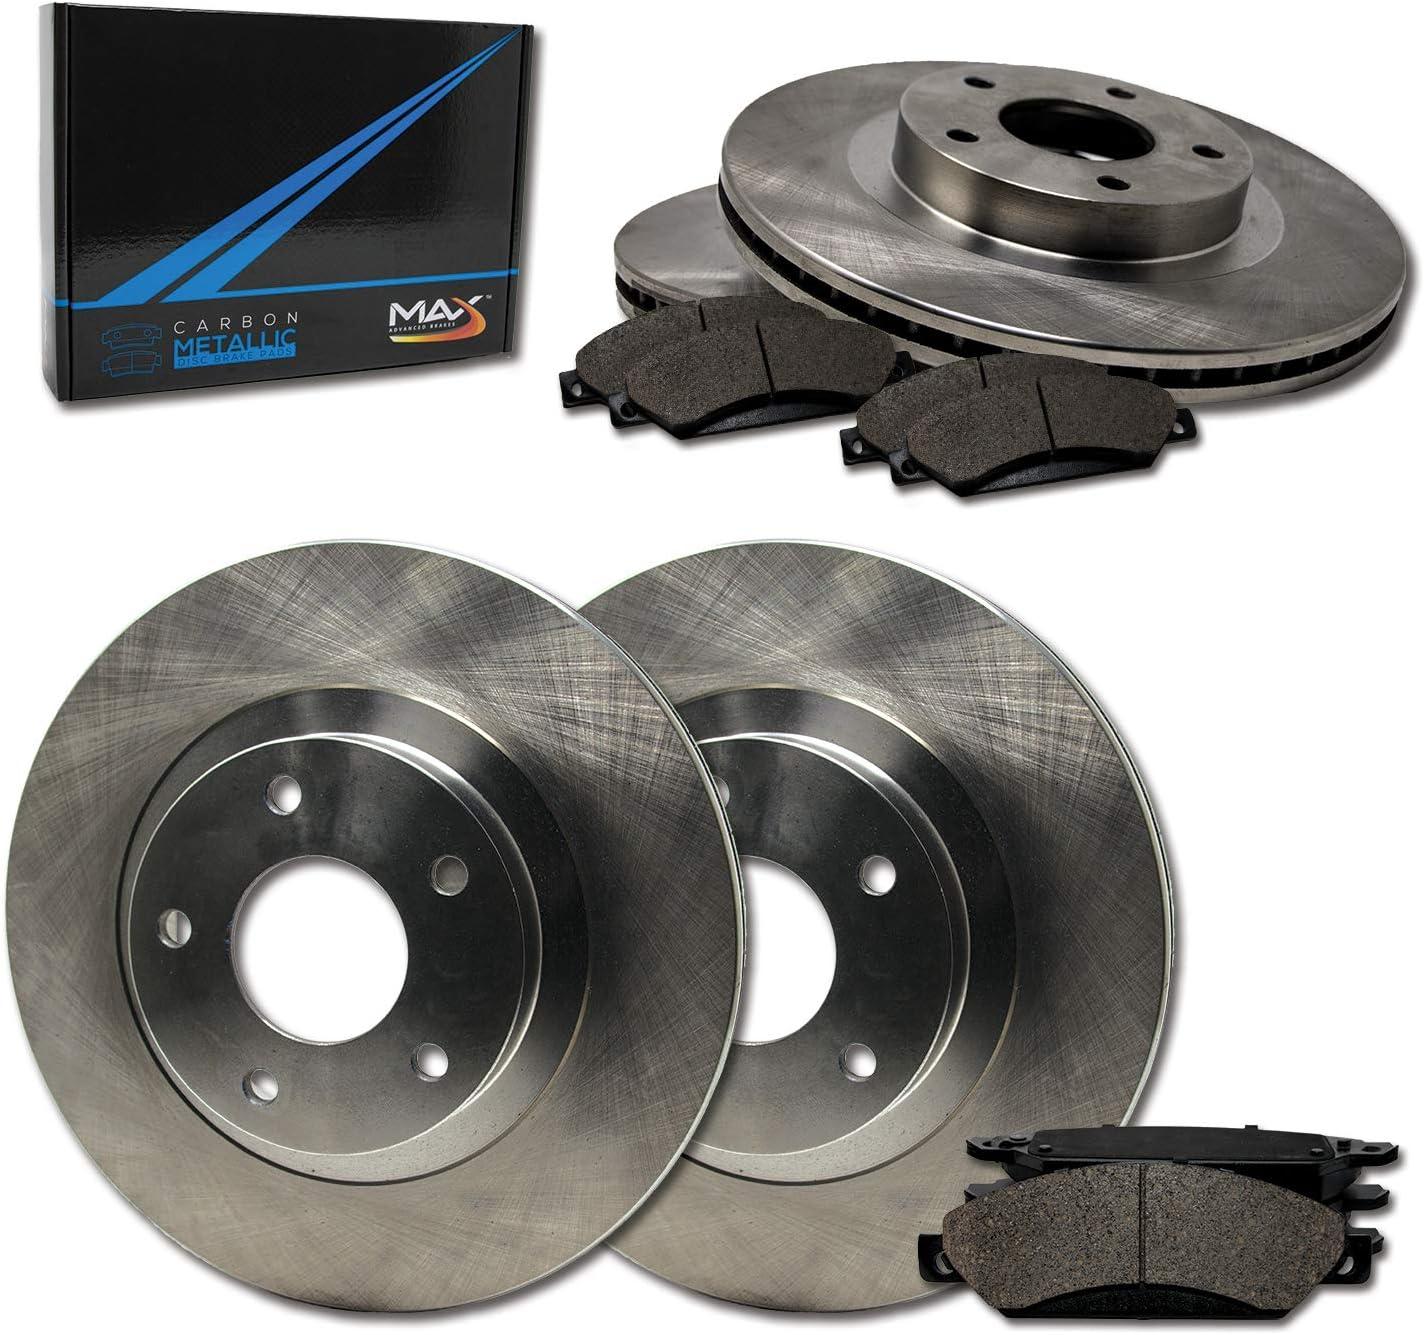 Max Brakes Front /& Rear Premium OE Rotors and Metallic Pads Brake Kit TA062343-5